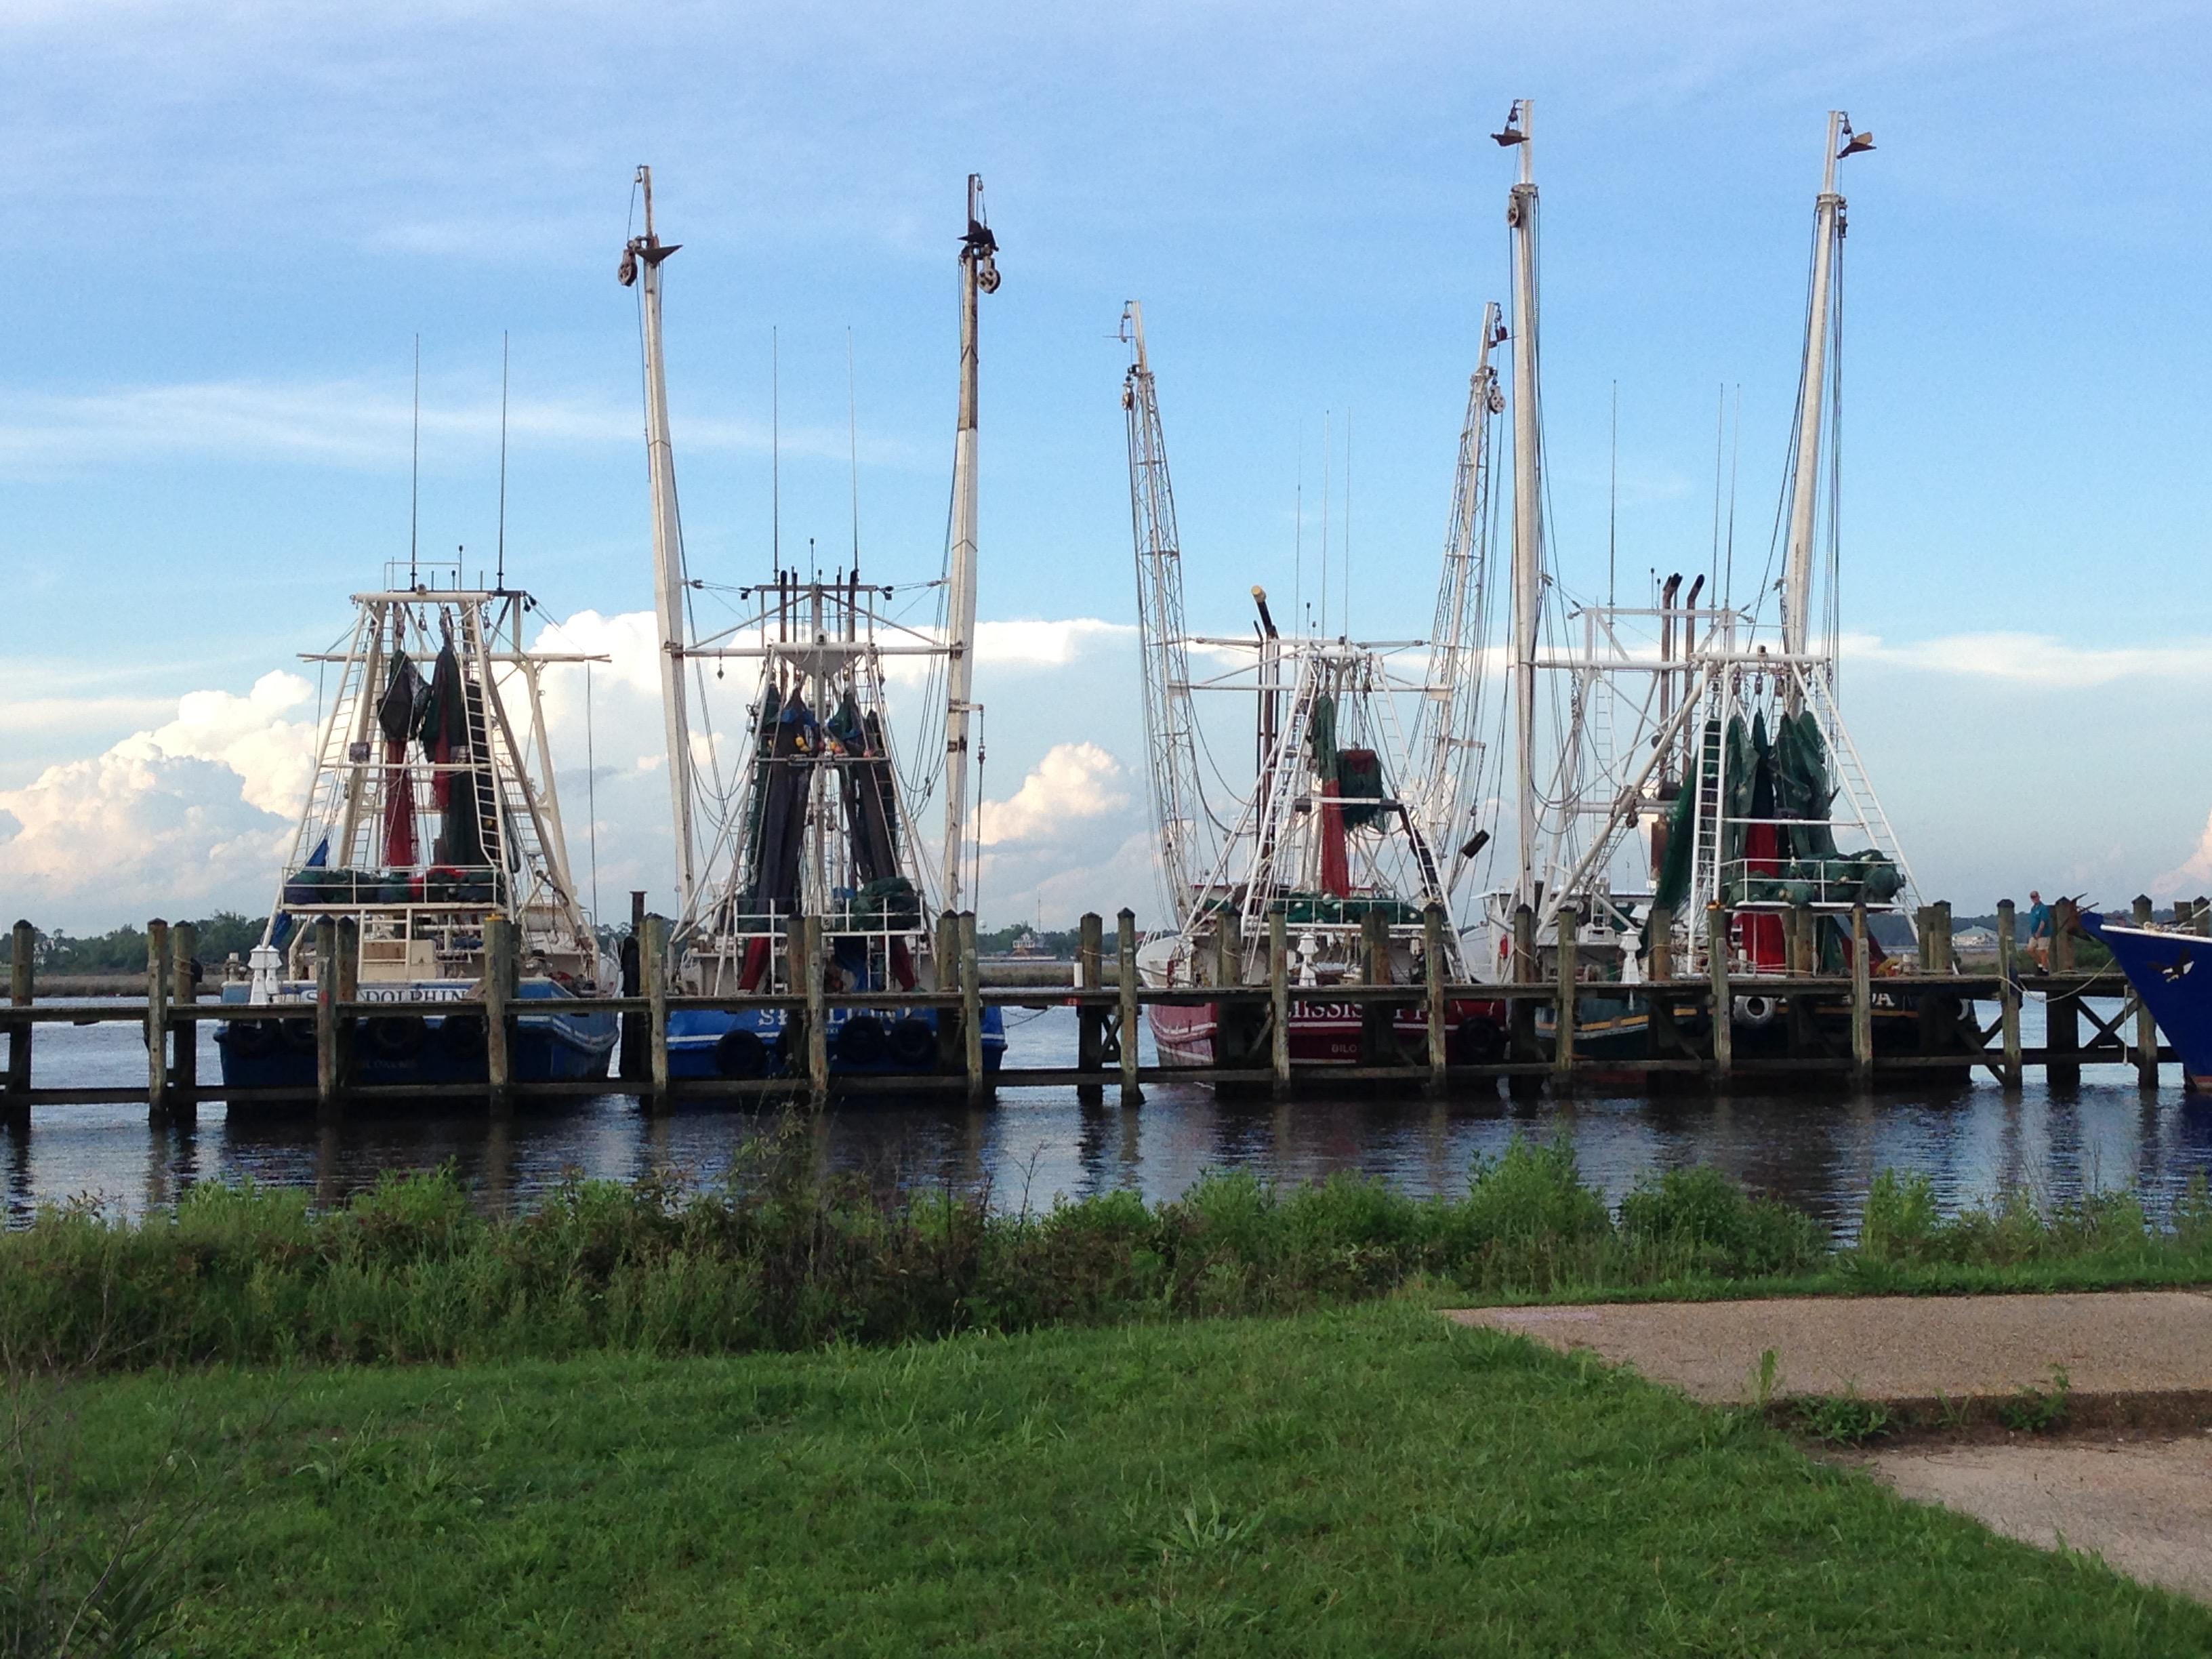 Fish_Boats_-_1.jpg